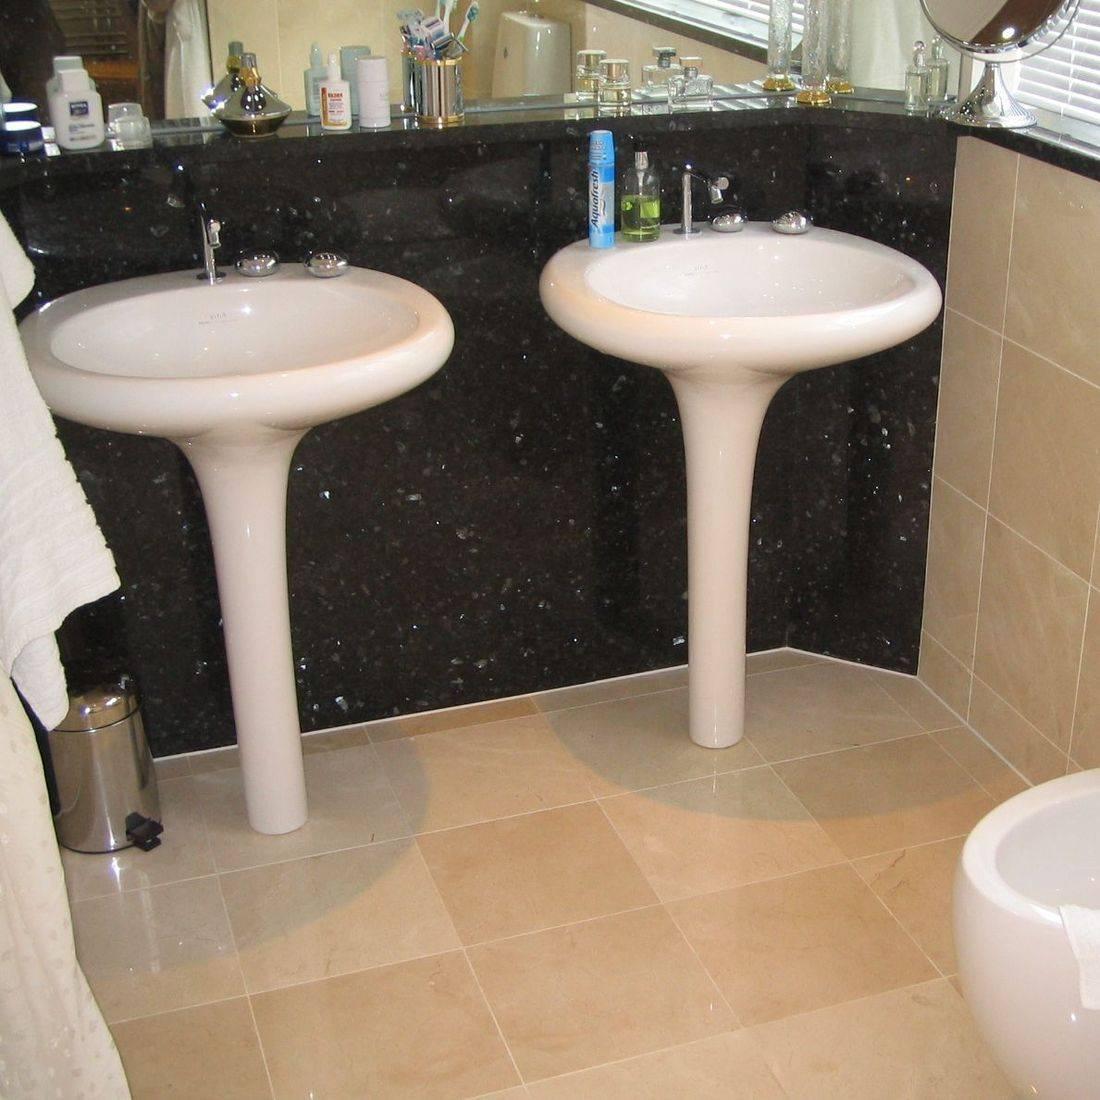 Tiler, Tiling, Tile, Newquay, Porth, Cornwall, Tiles, Kitchen, Bathroom